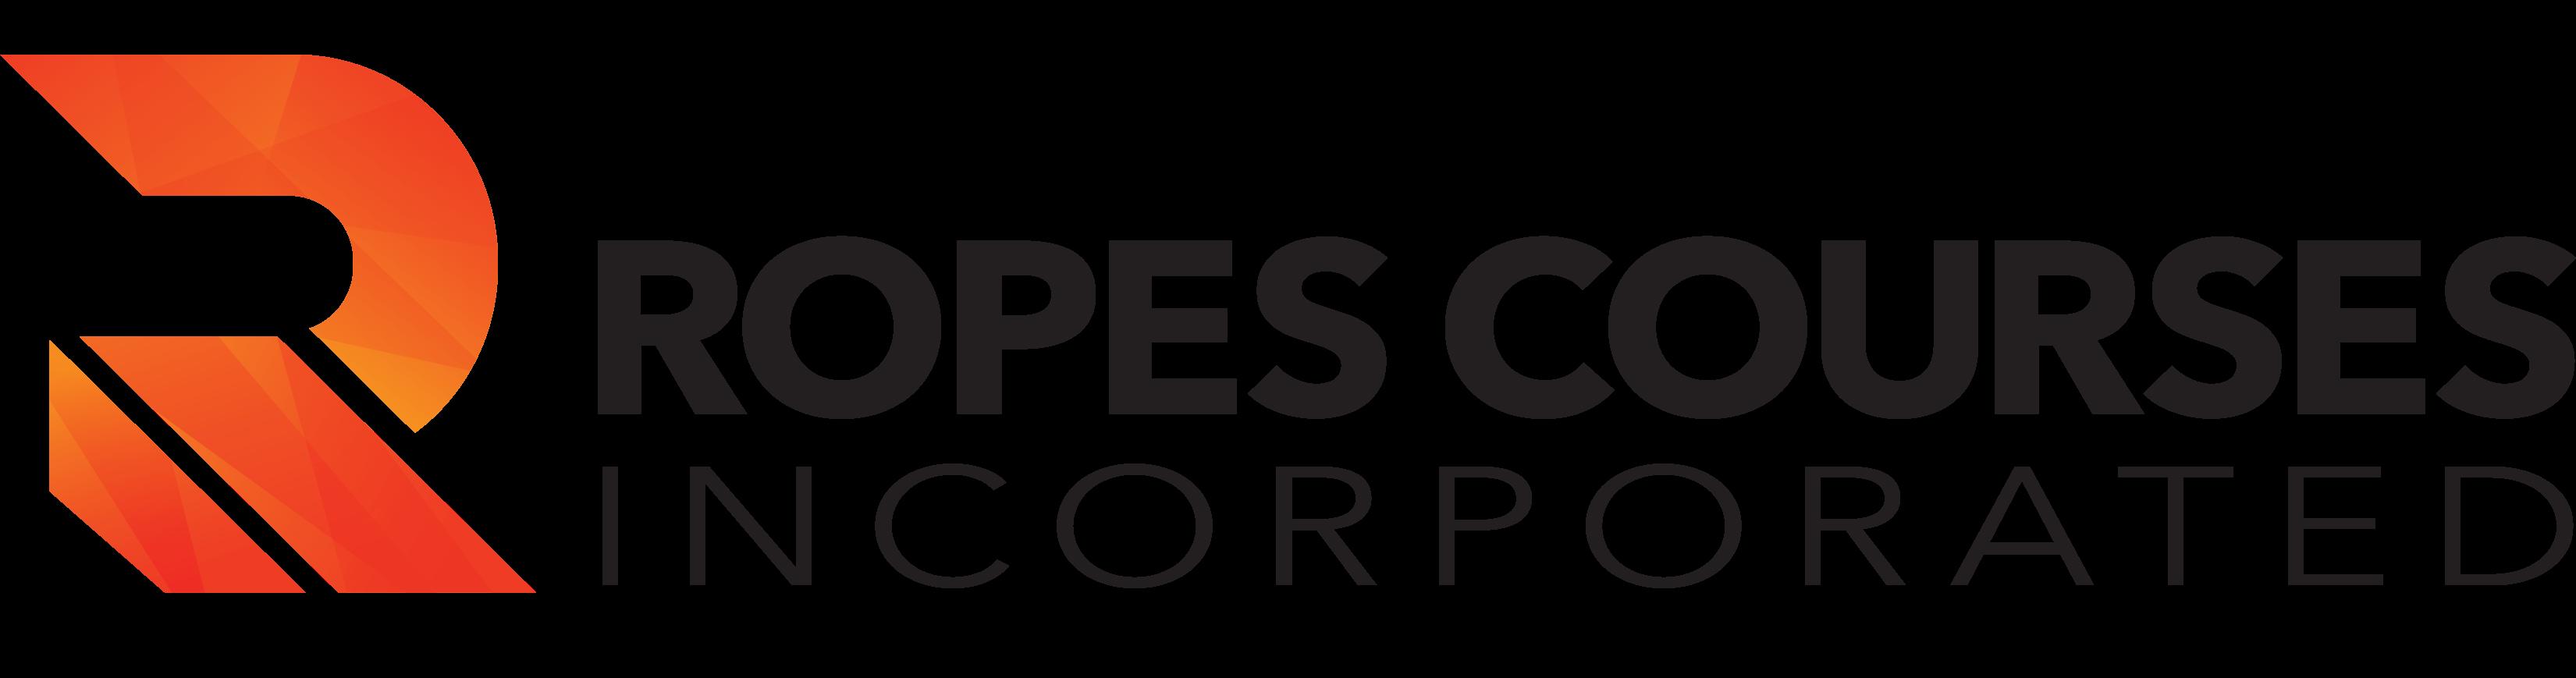 Ropes Courses, Inc. (RCI) Logo